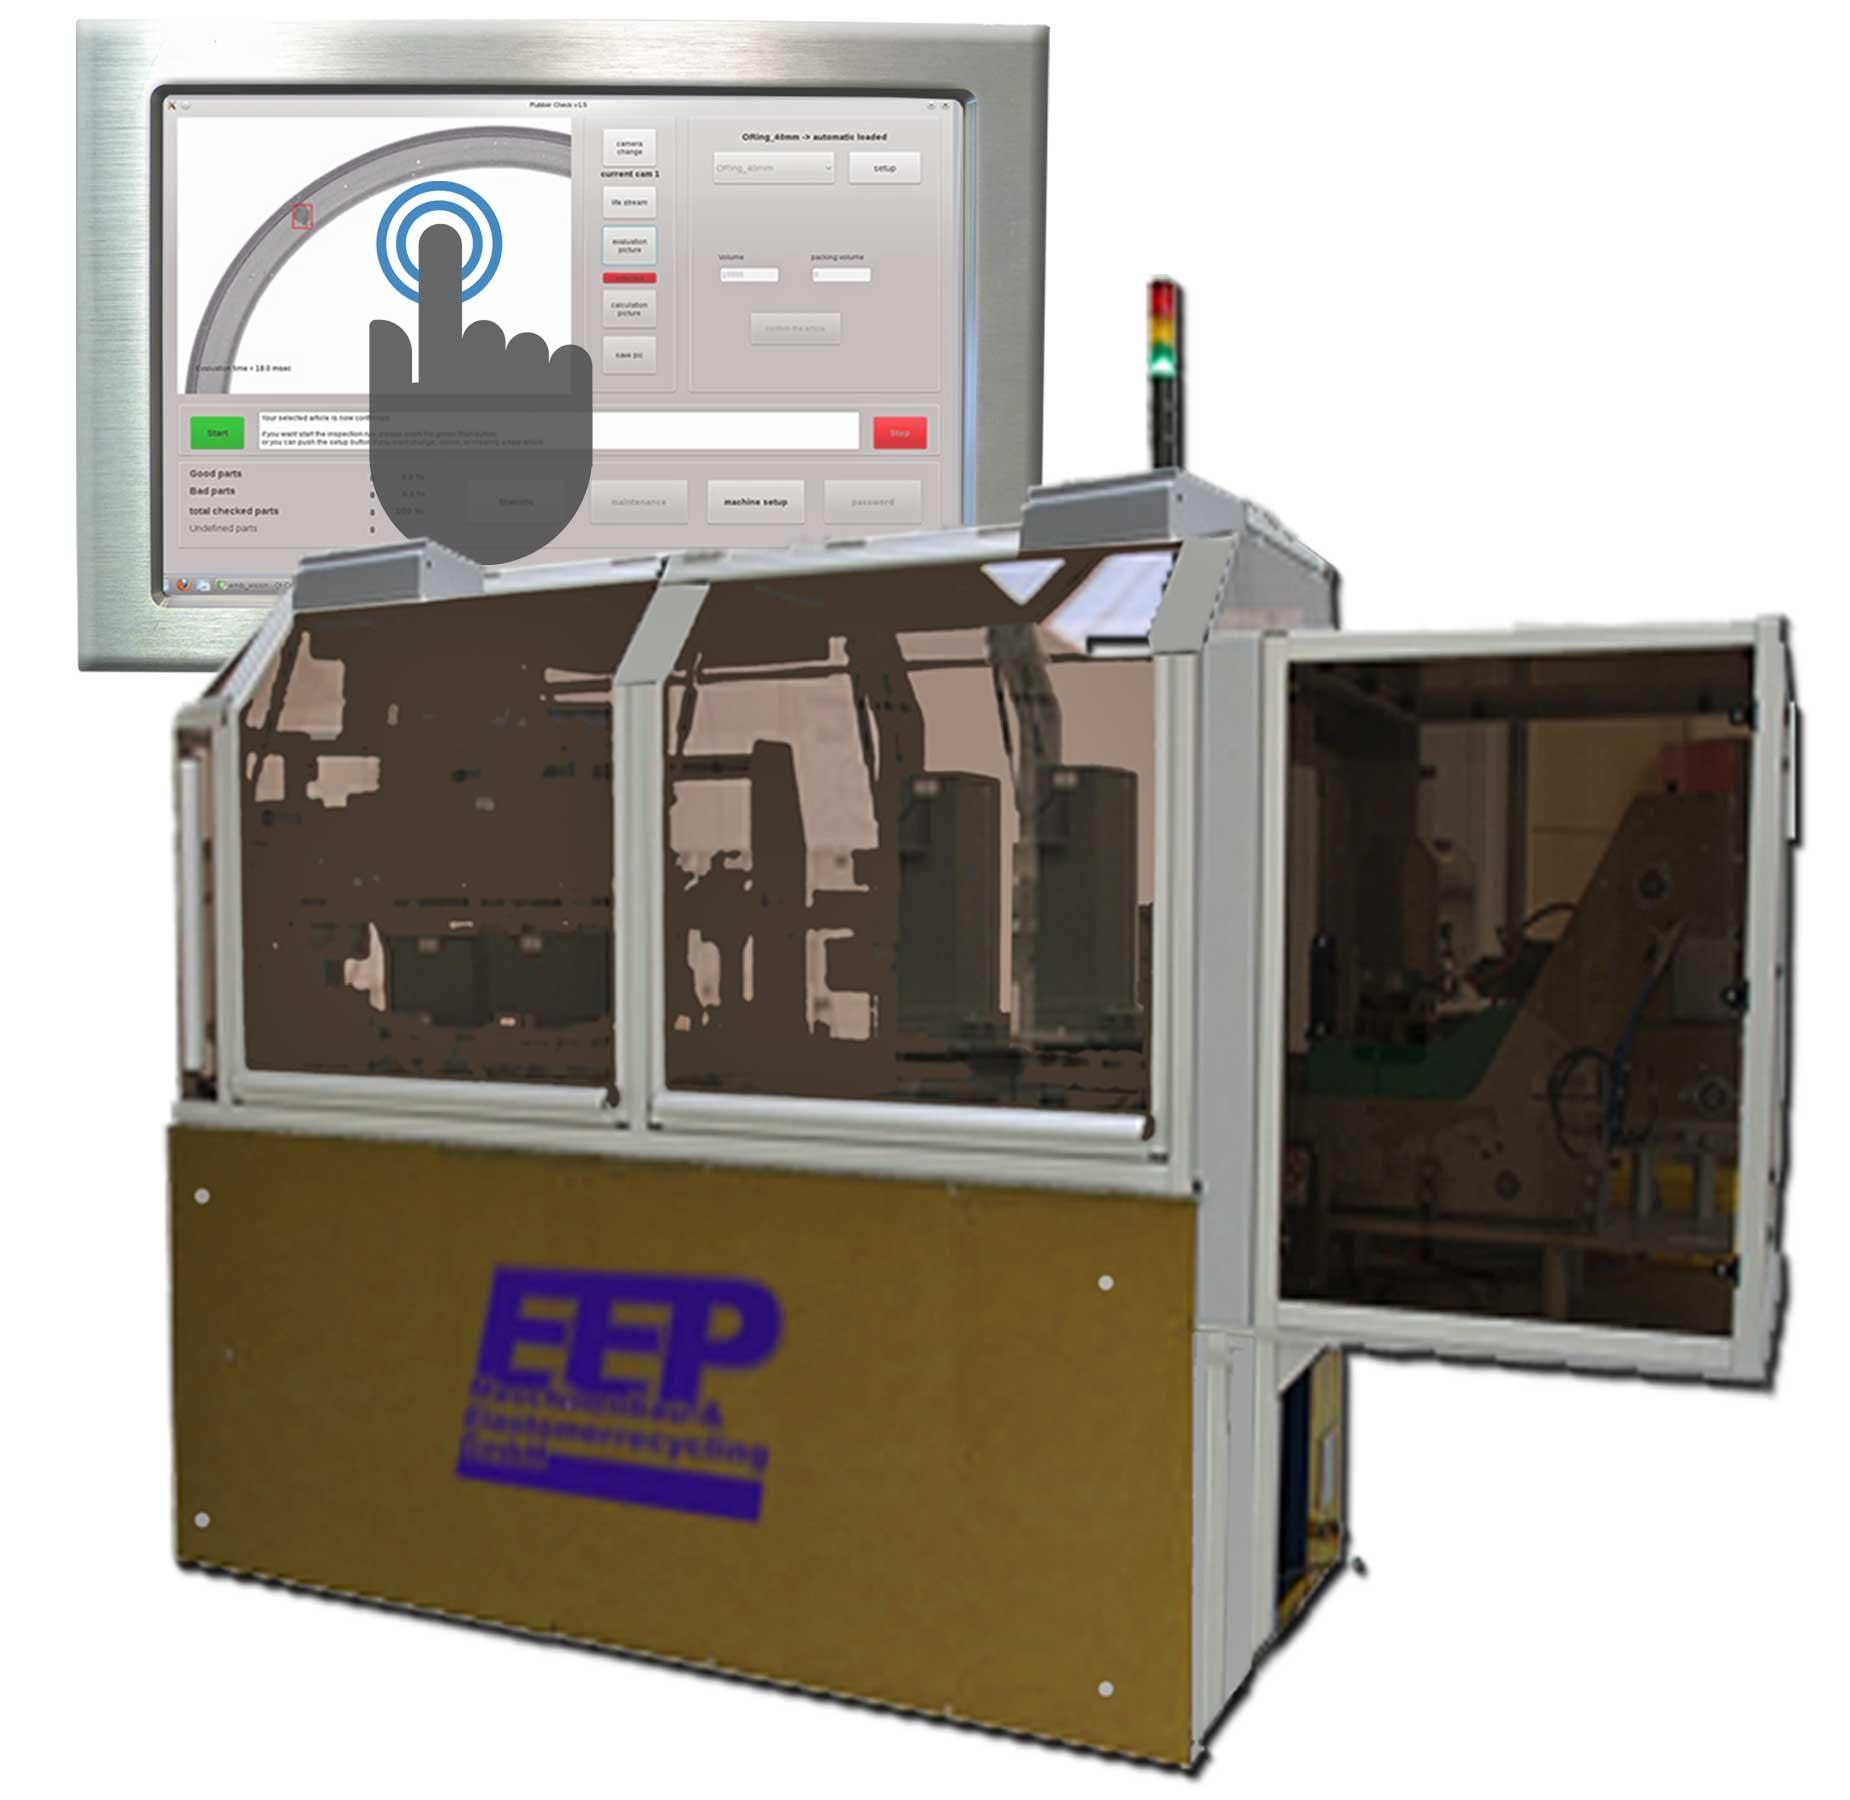 KTline - EEP Maschinenbau GmbH